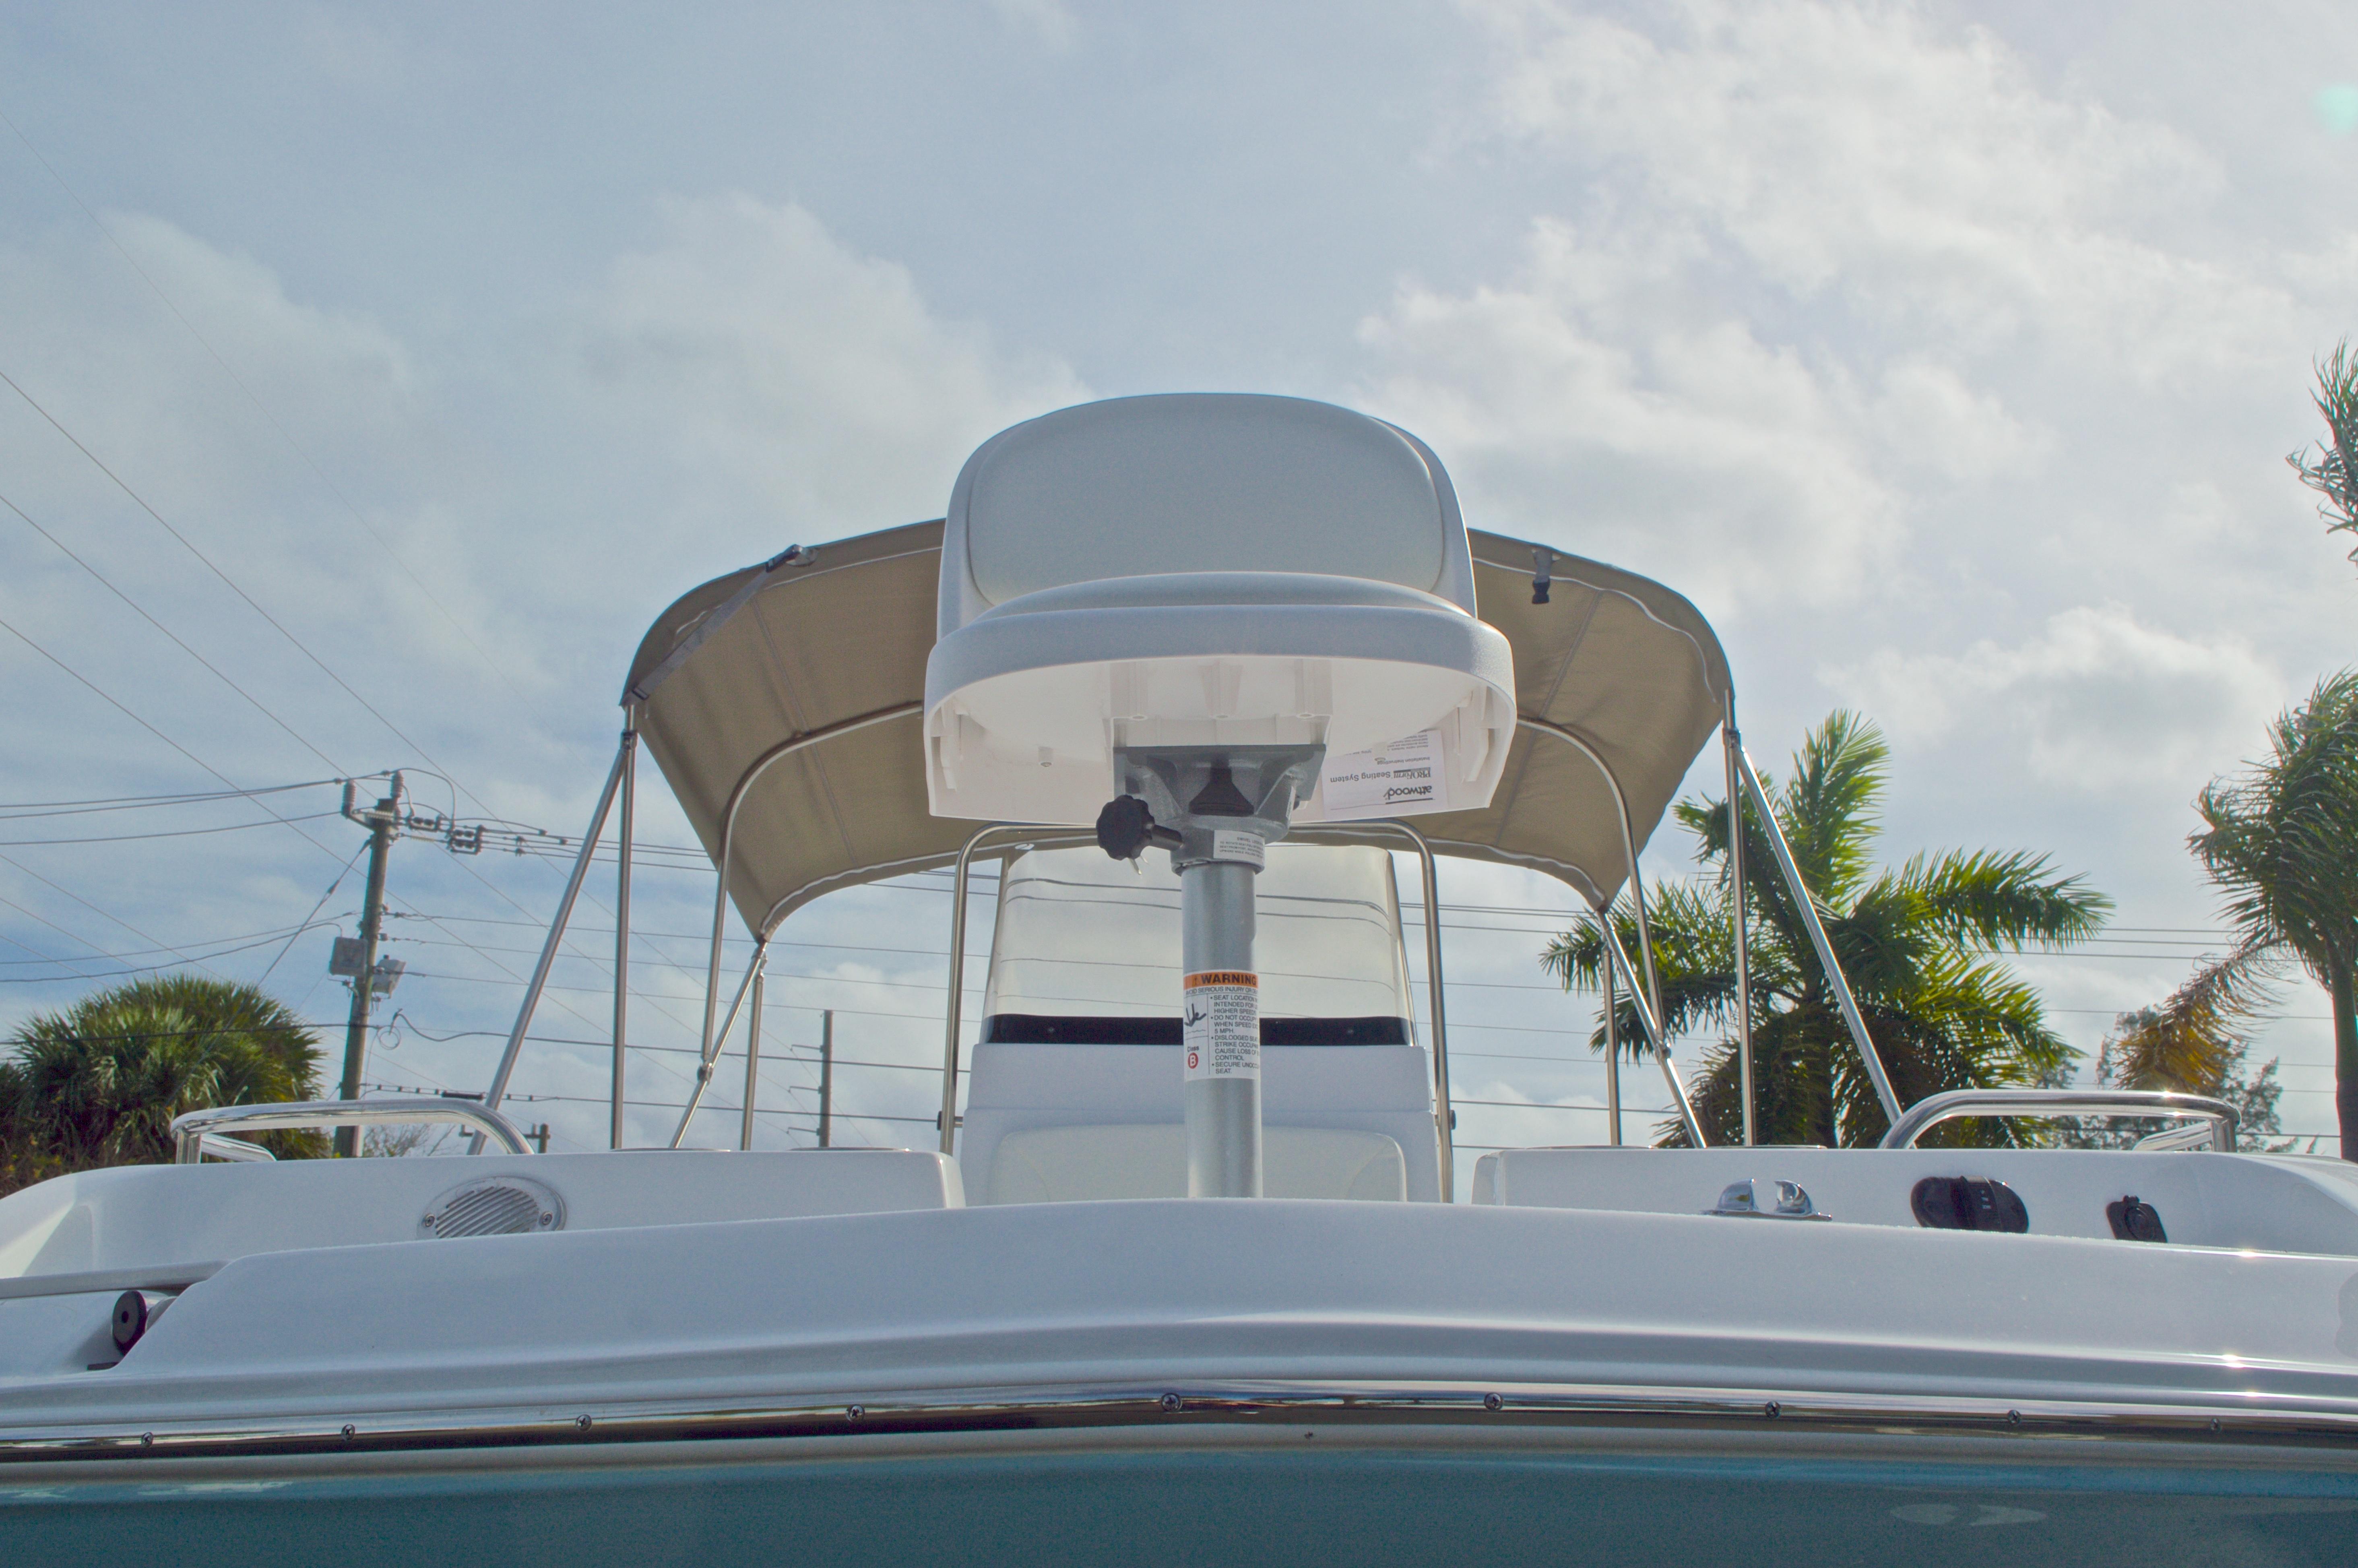 Thumbnail 4 for New 2016 Hurricane CC21 Center Console boat for sale in Vero Beach, FL